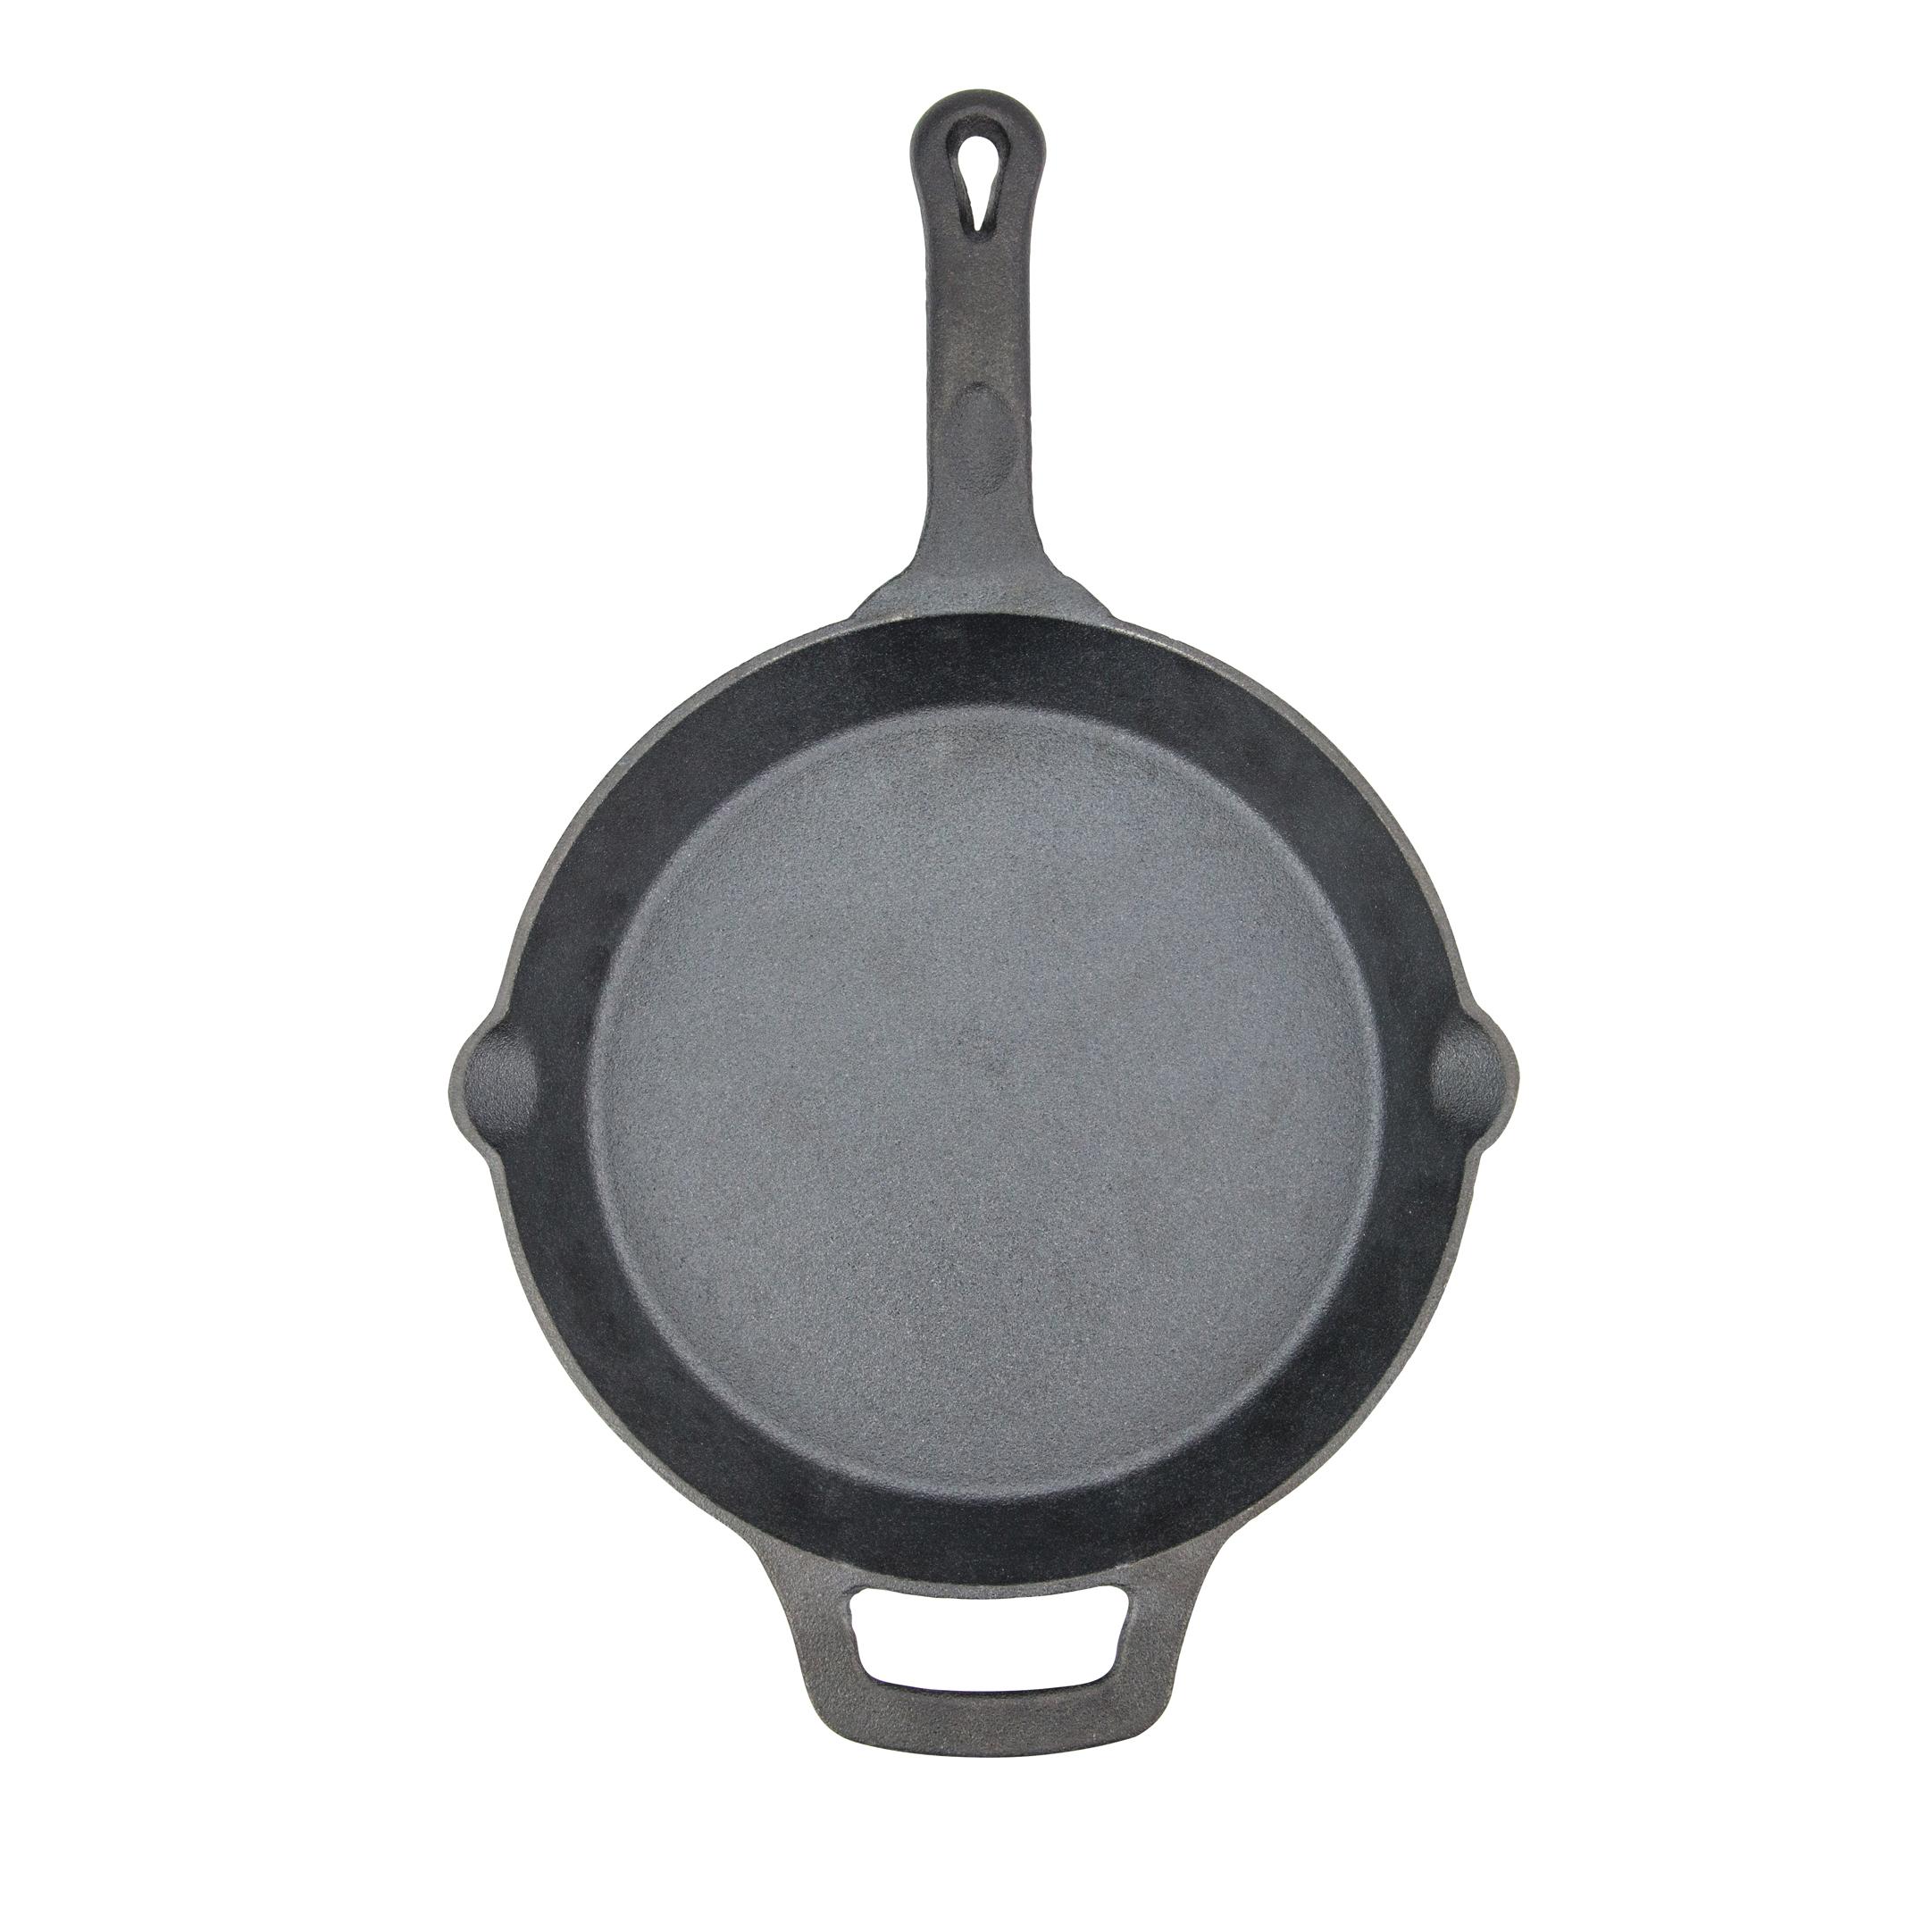 Winco CAST-10 cast iron fry pan